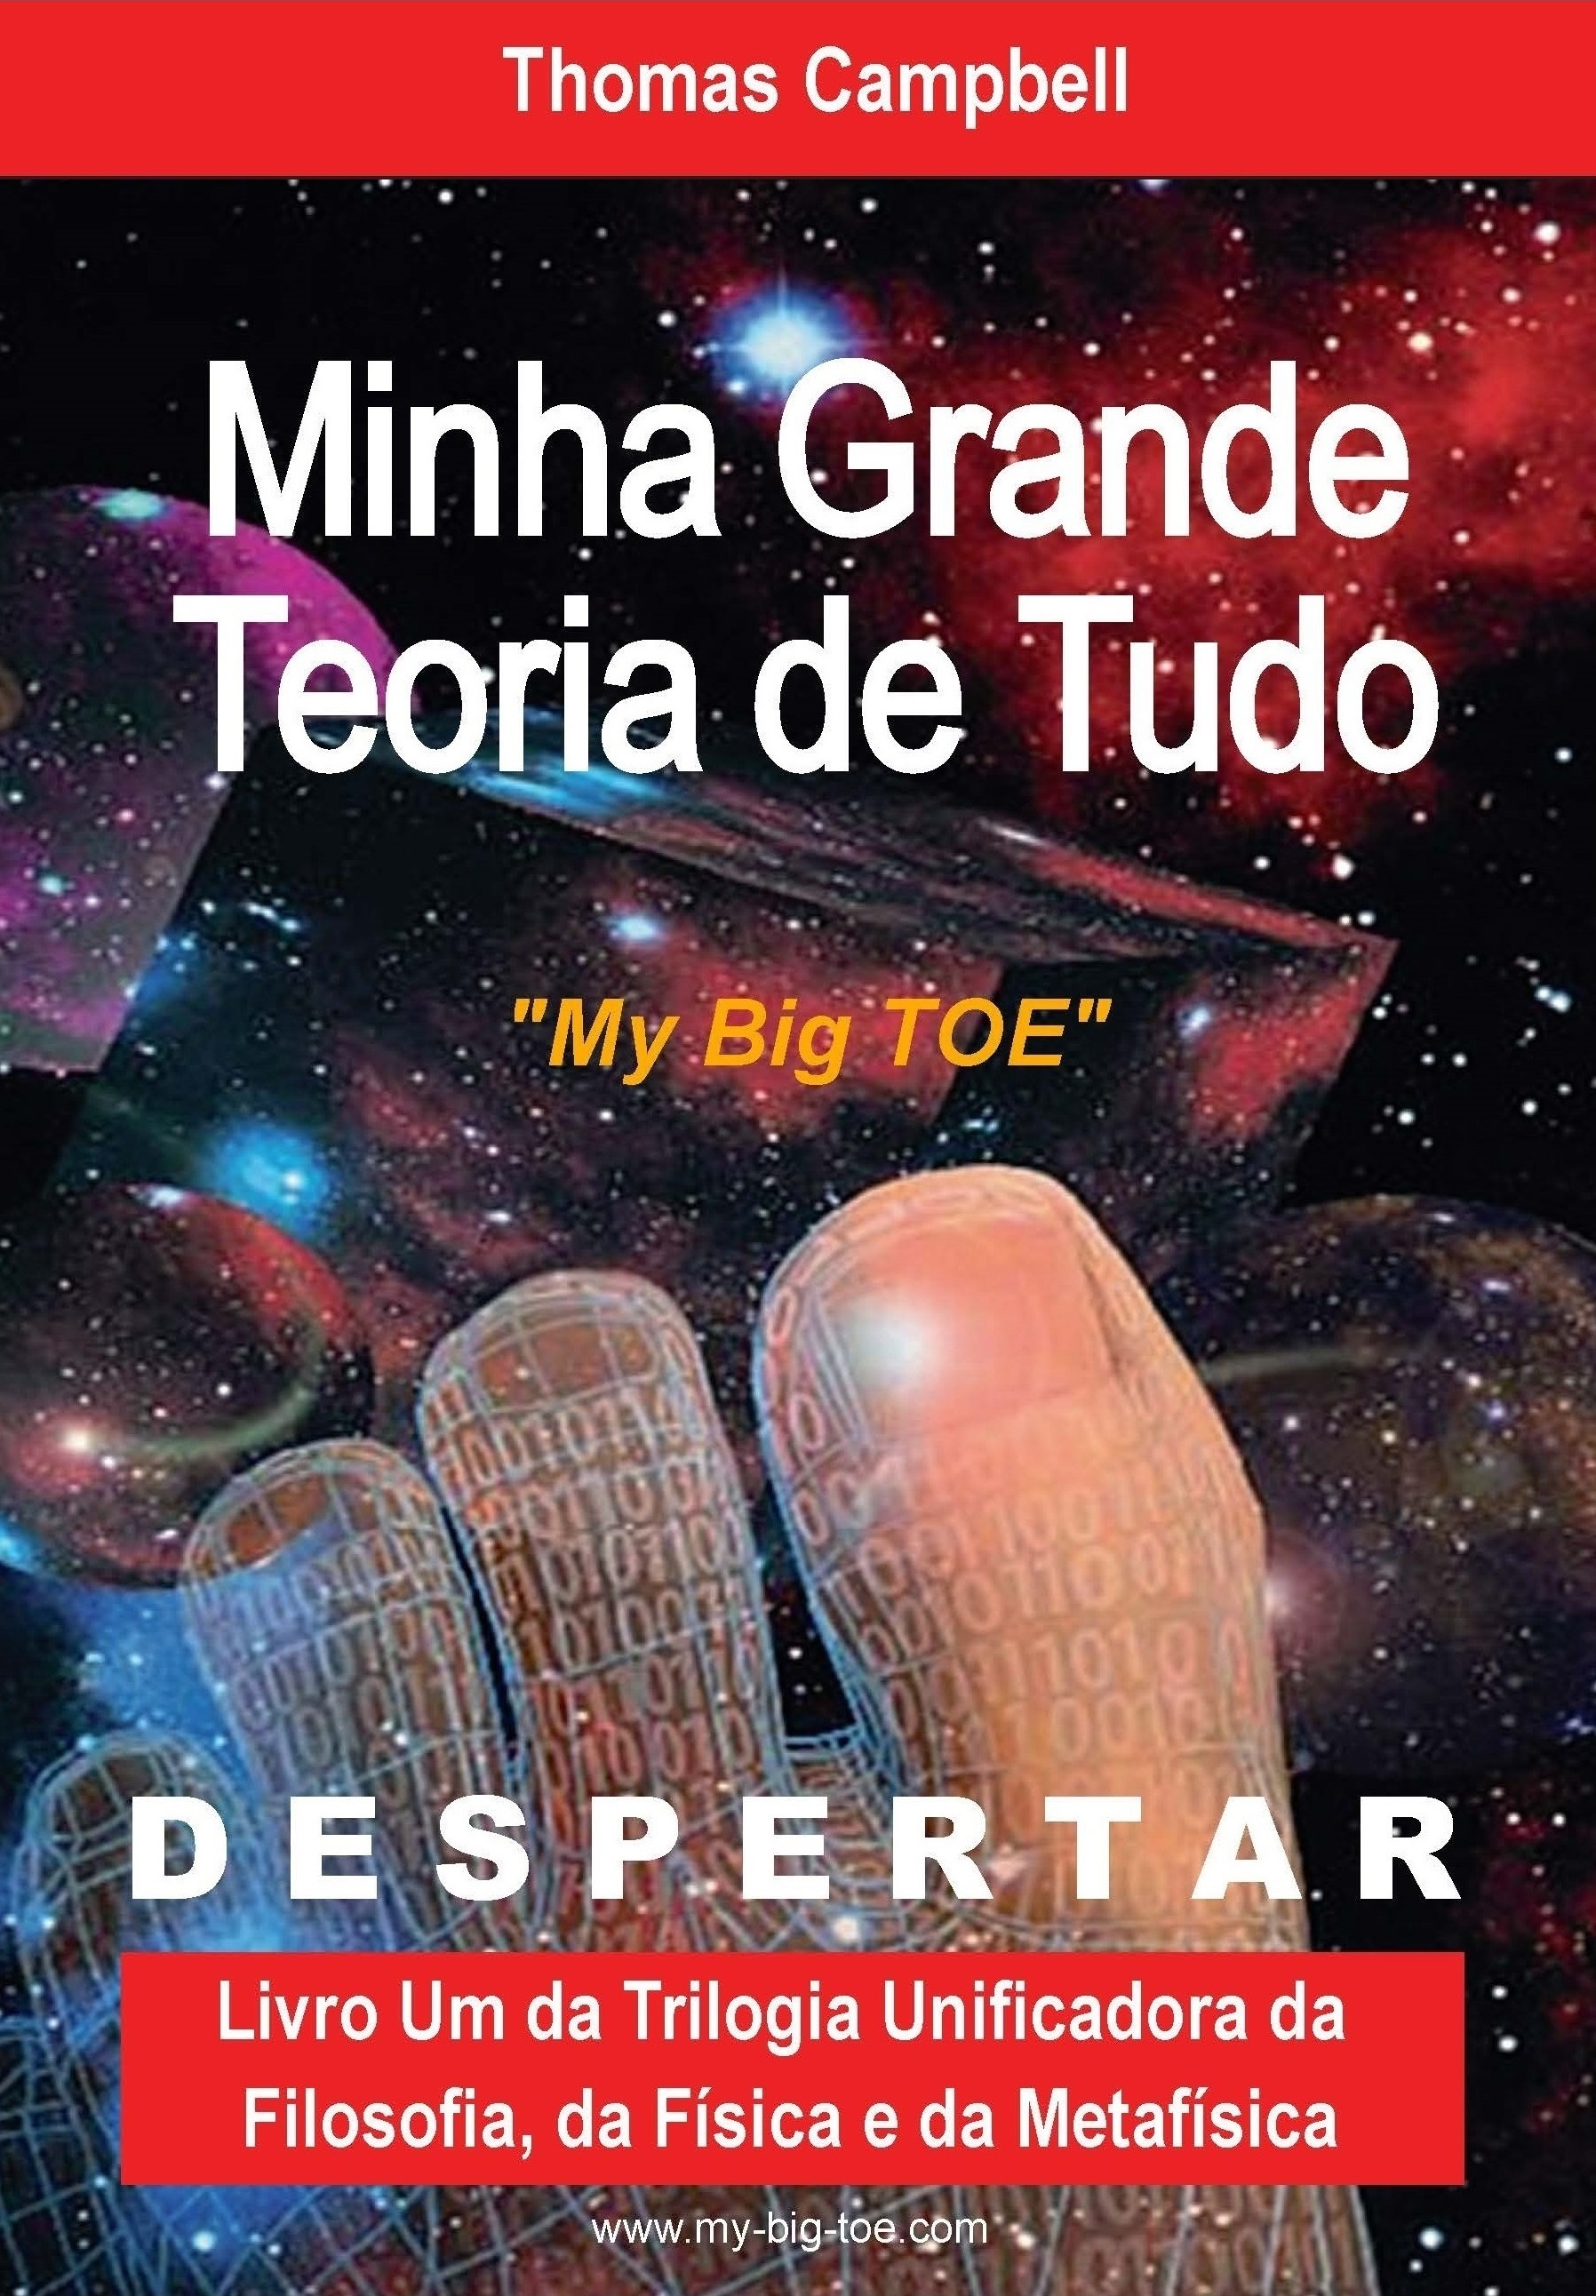 sinopse-livro-my-big-toe